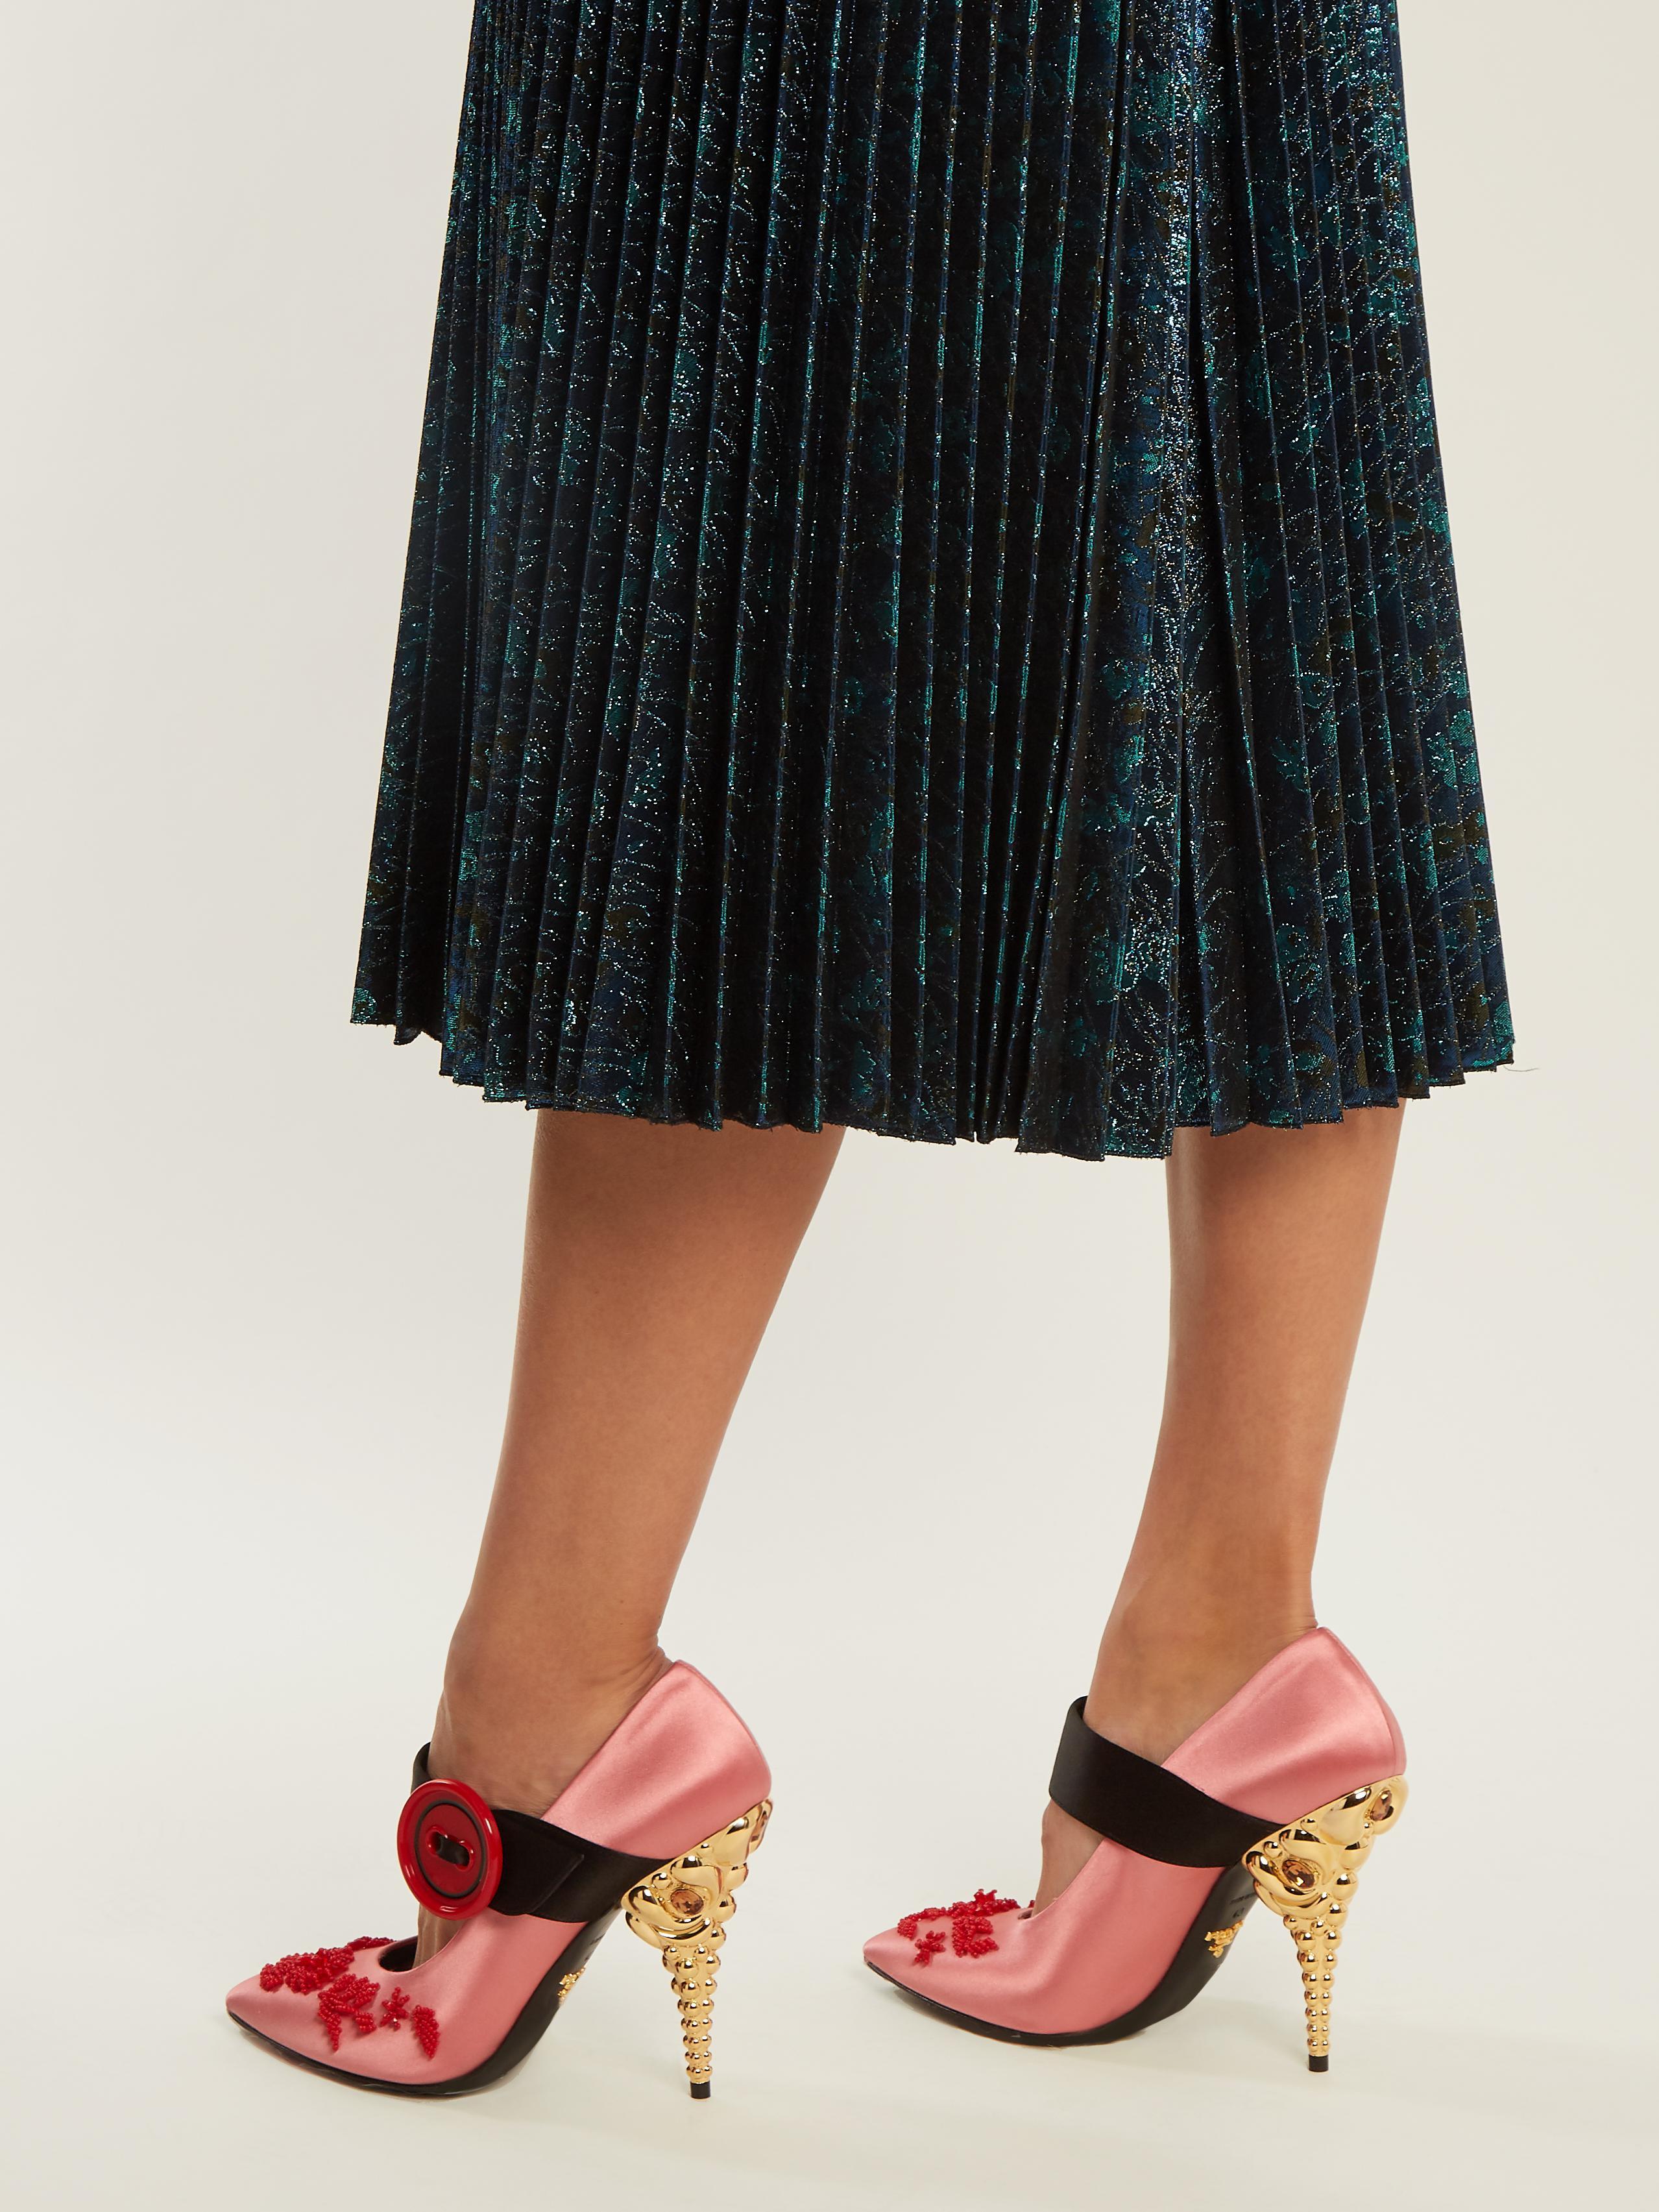 Embellished Satin Sandals - Pink Prada Ow7tMFriao